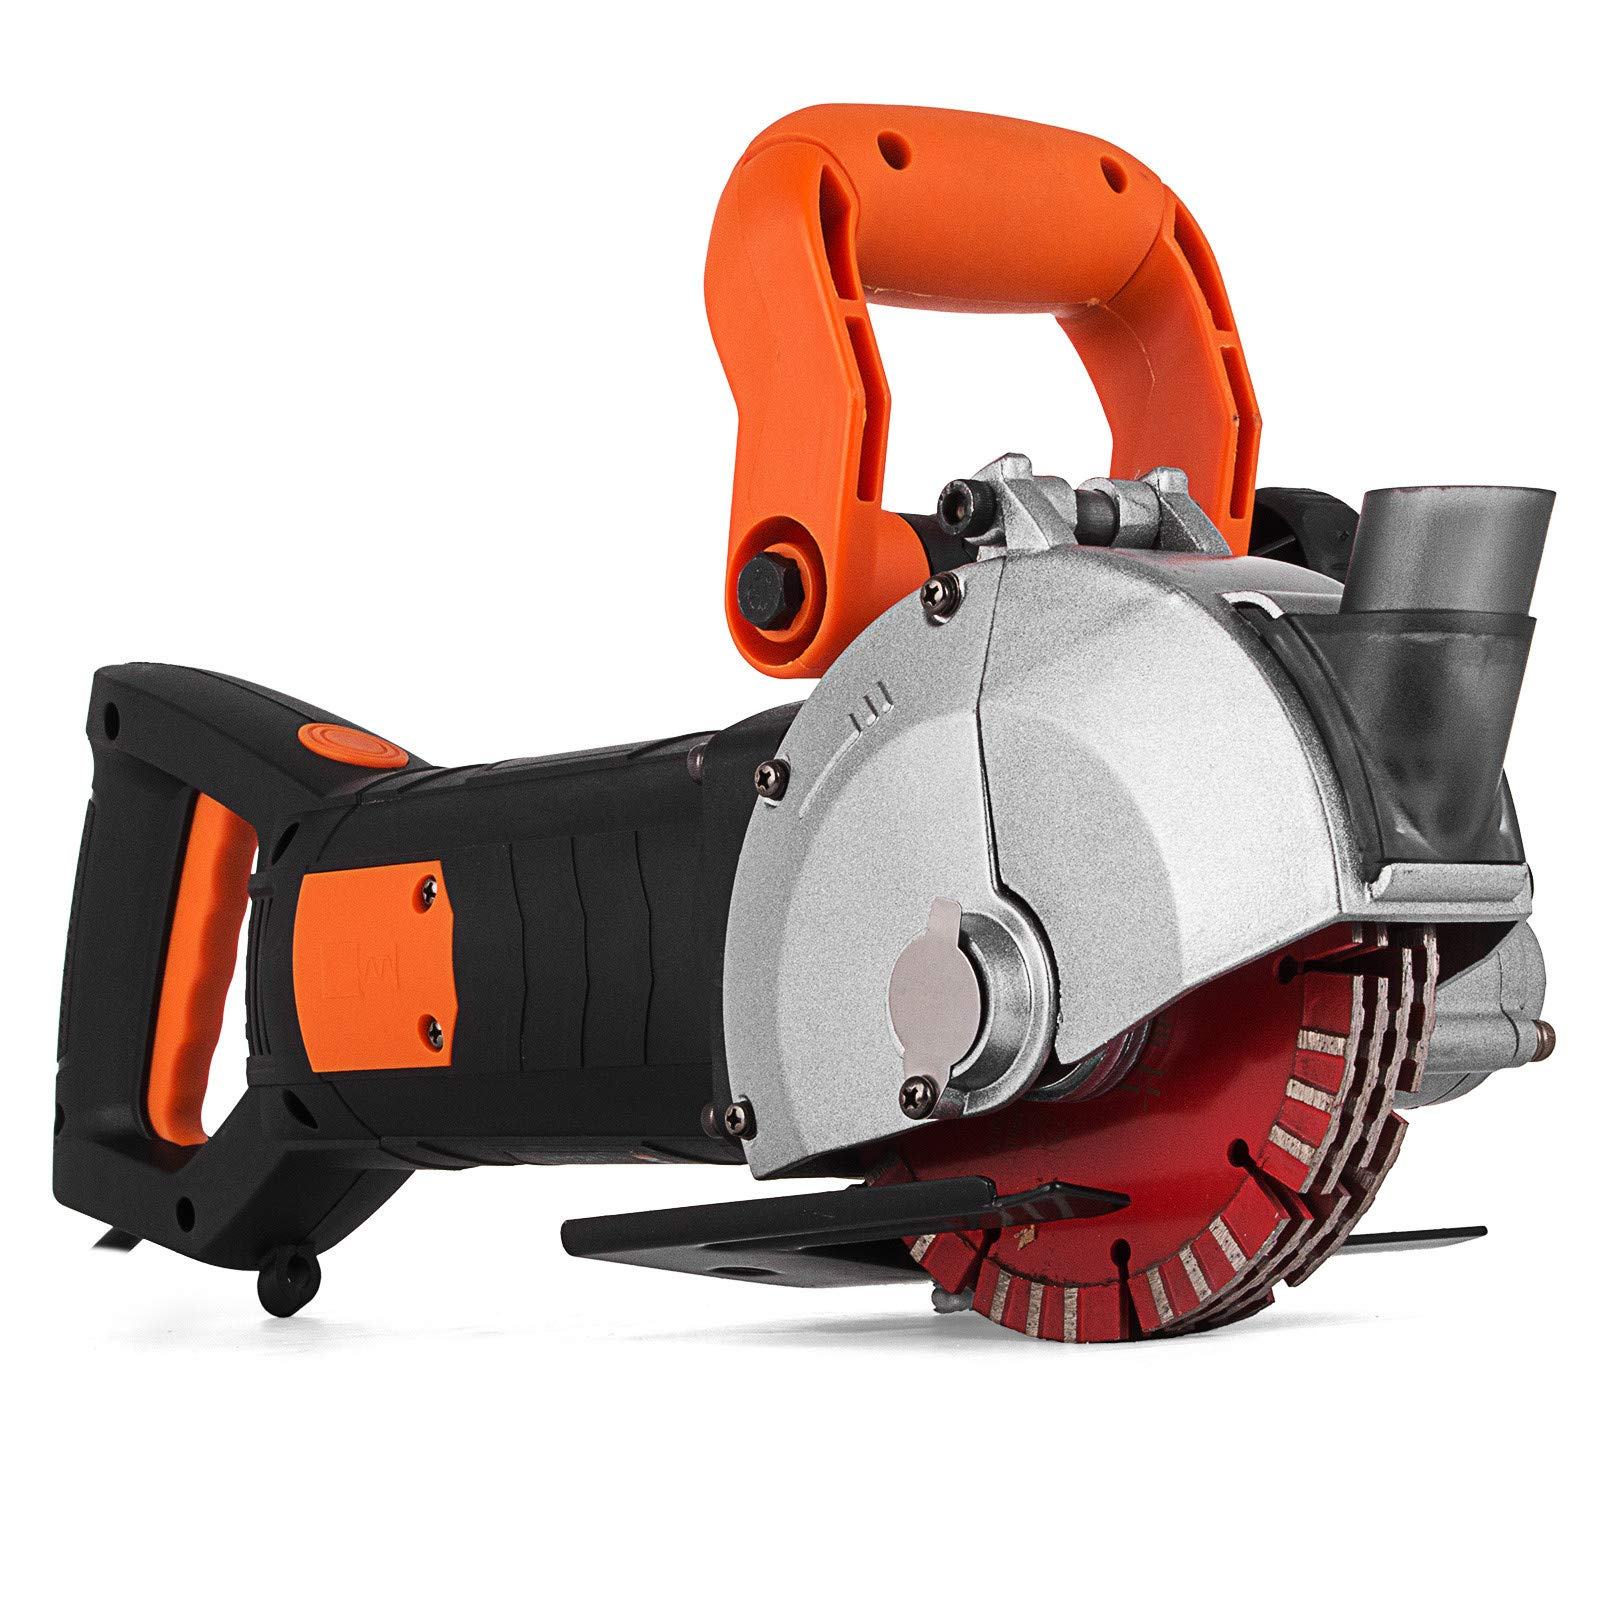 Mophorn K1331 Máquina Ranuradora de Corte para Pared 42 mm 4800W ...